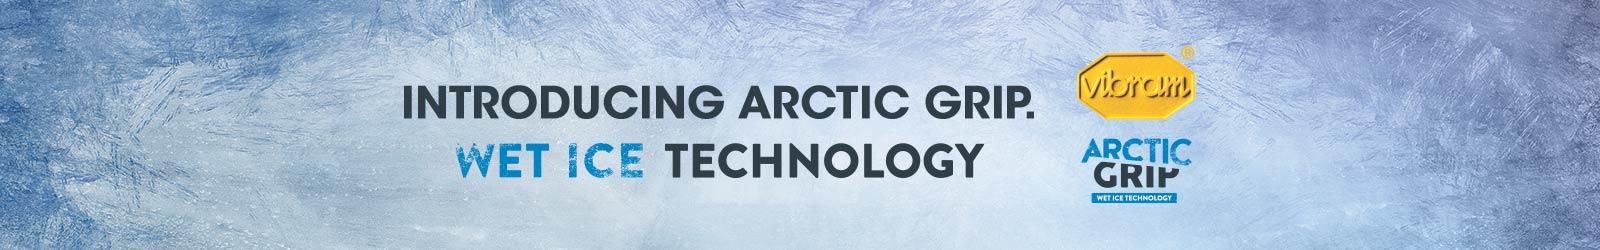 Introducing Arctic Grip. Wet Ice Technology | Vibram | Arctic Grip